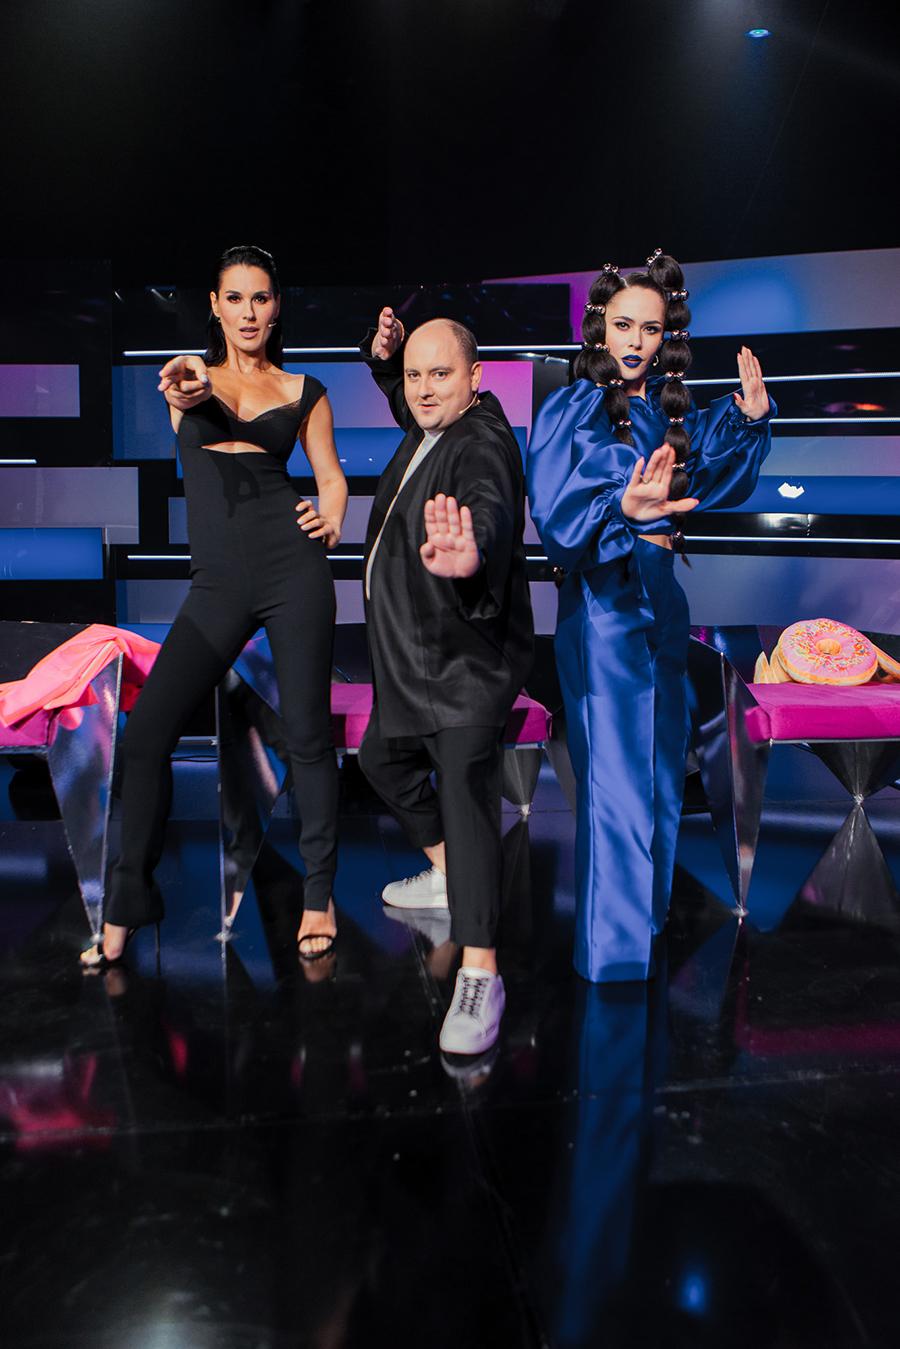 шоу маскарад 1+1 второй сезон жюри участники ирина билык дантес игорь ласточкин